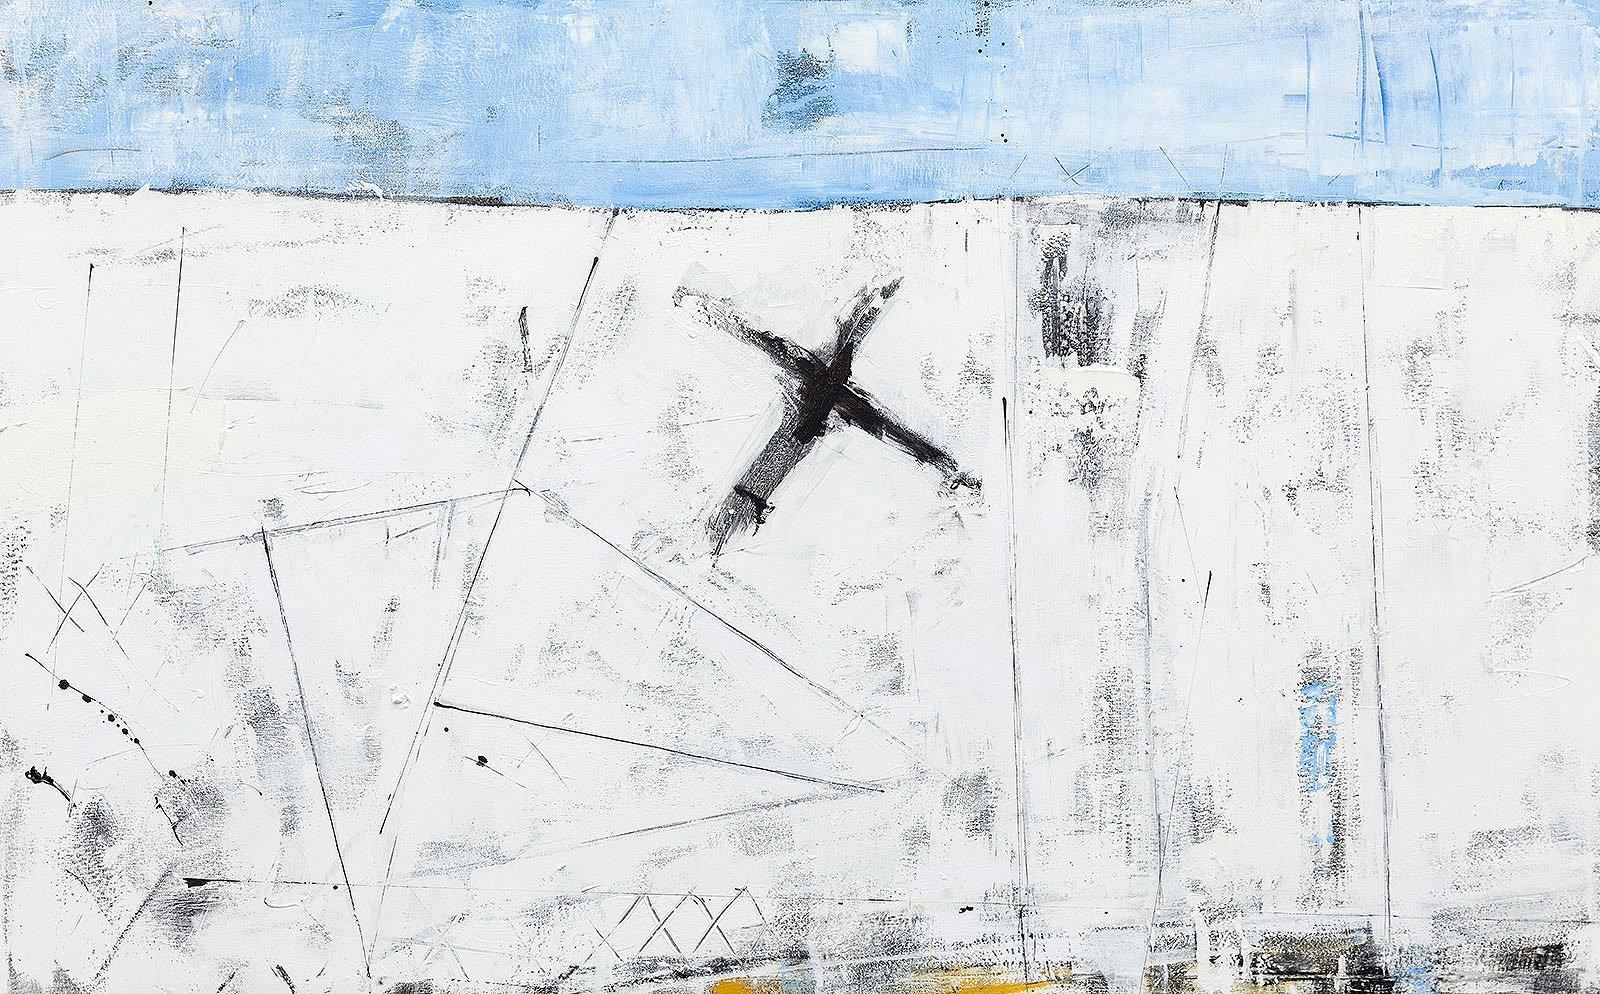 Cuadro abstracto gila dos ocho